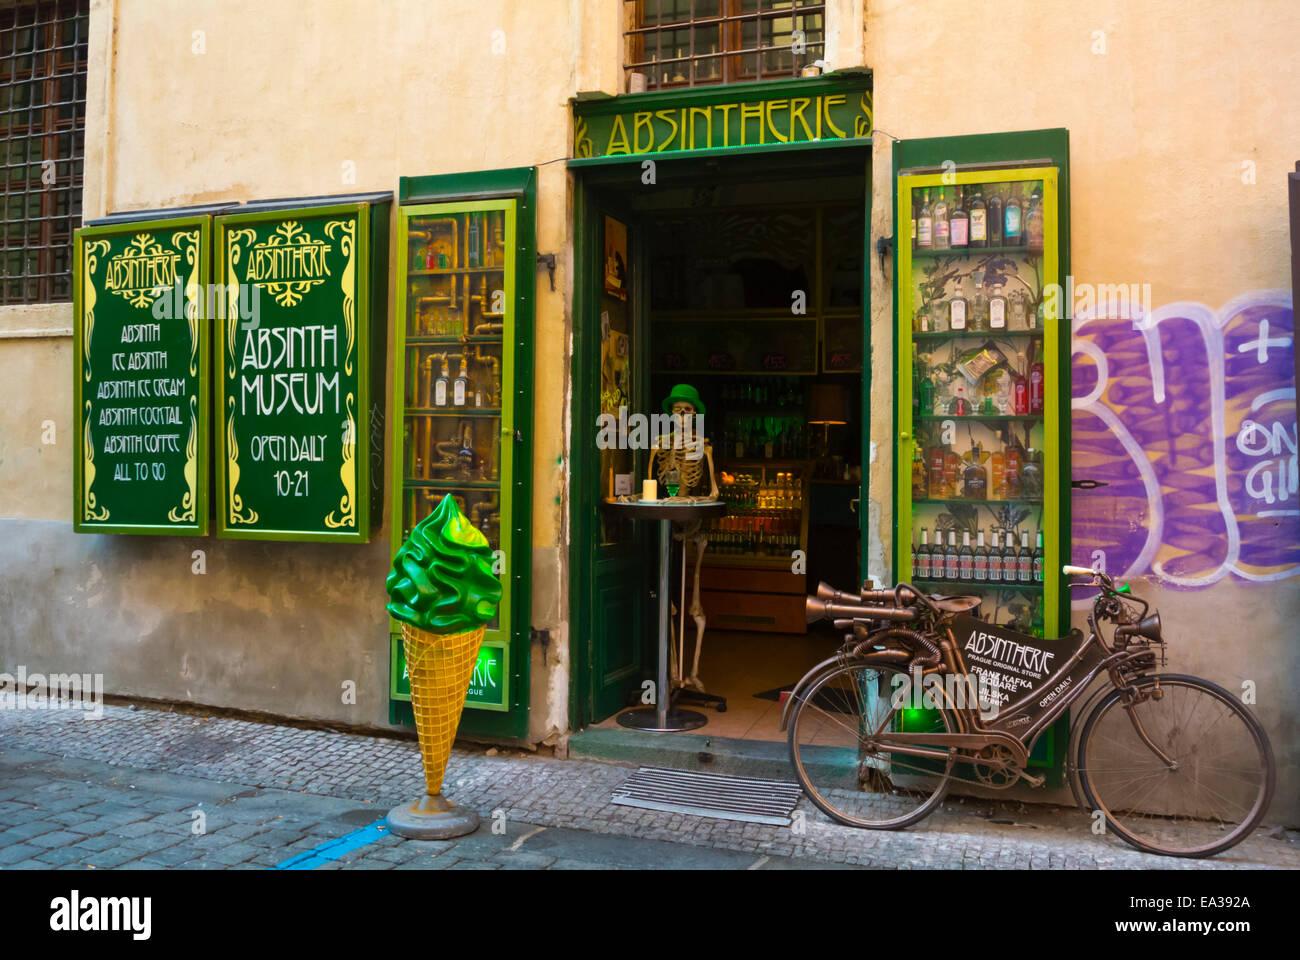 Absintherie, Absinth-Museum, bar, alte Stadt, Prag, Tschechische Republik, Europa Stockbild